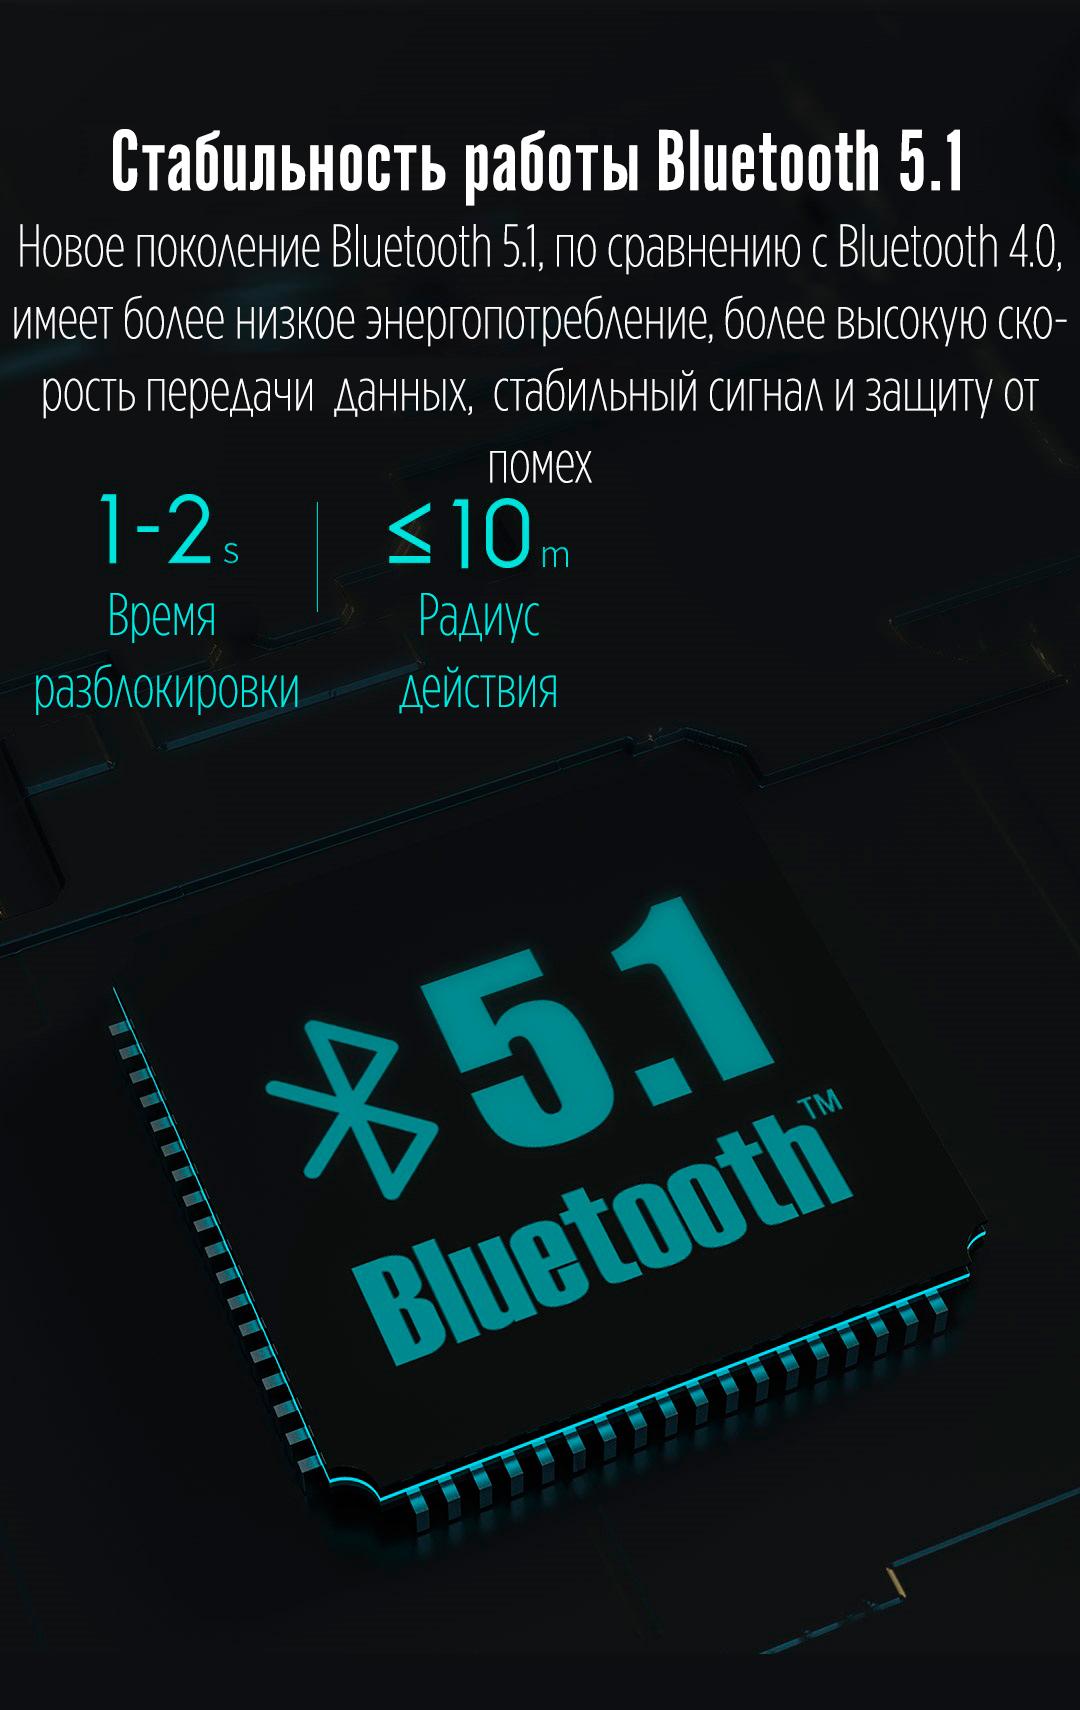 1600x_image.png?1595419185